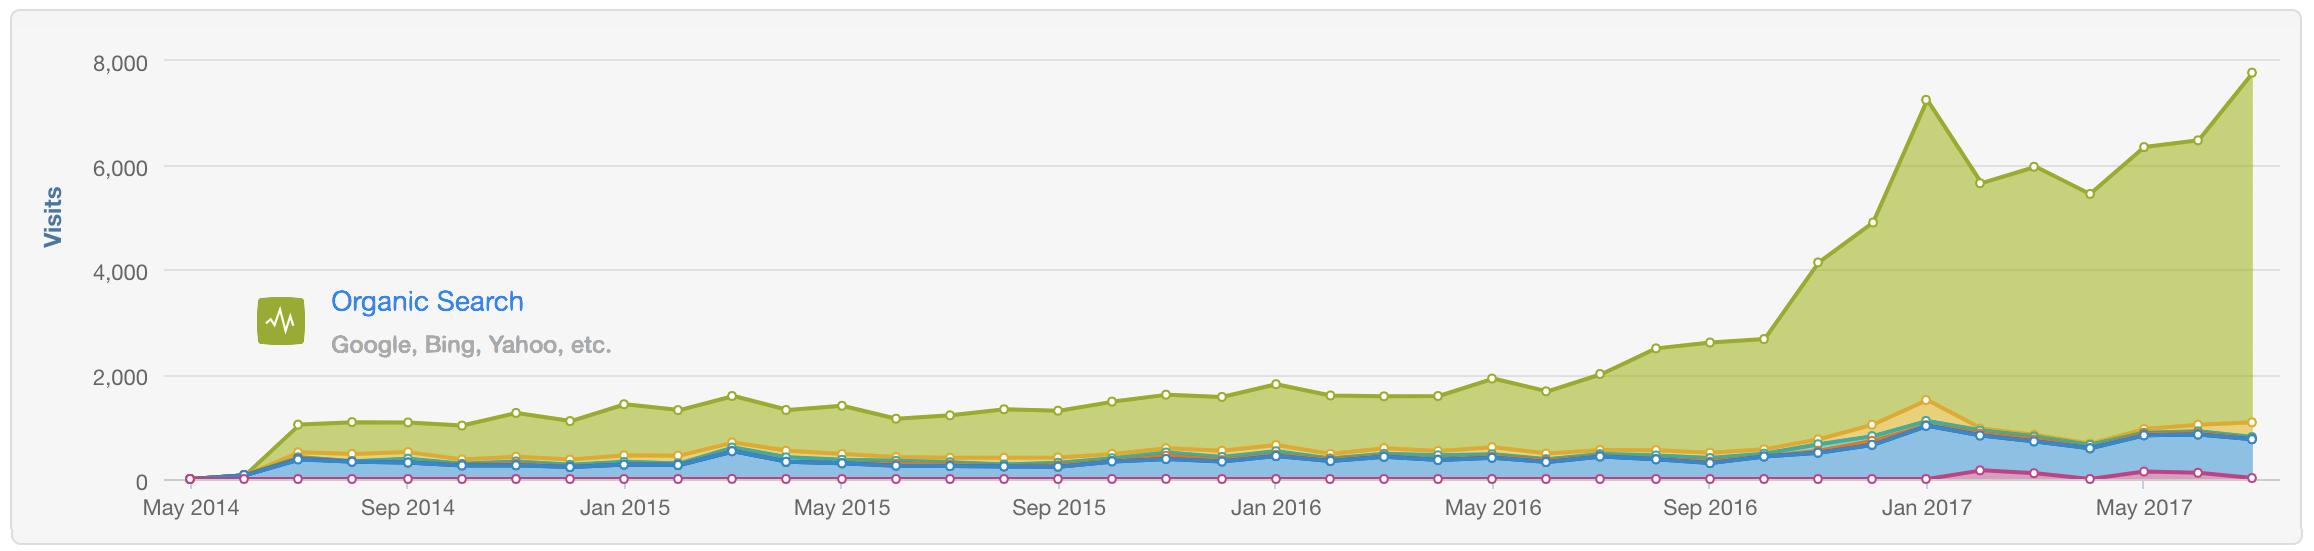 seo-search-engine-optimization-growth-inbund-marketing.png